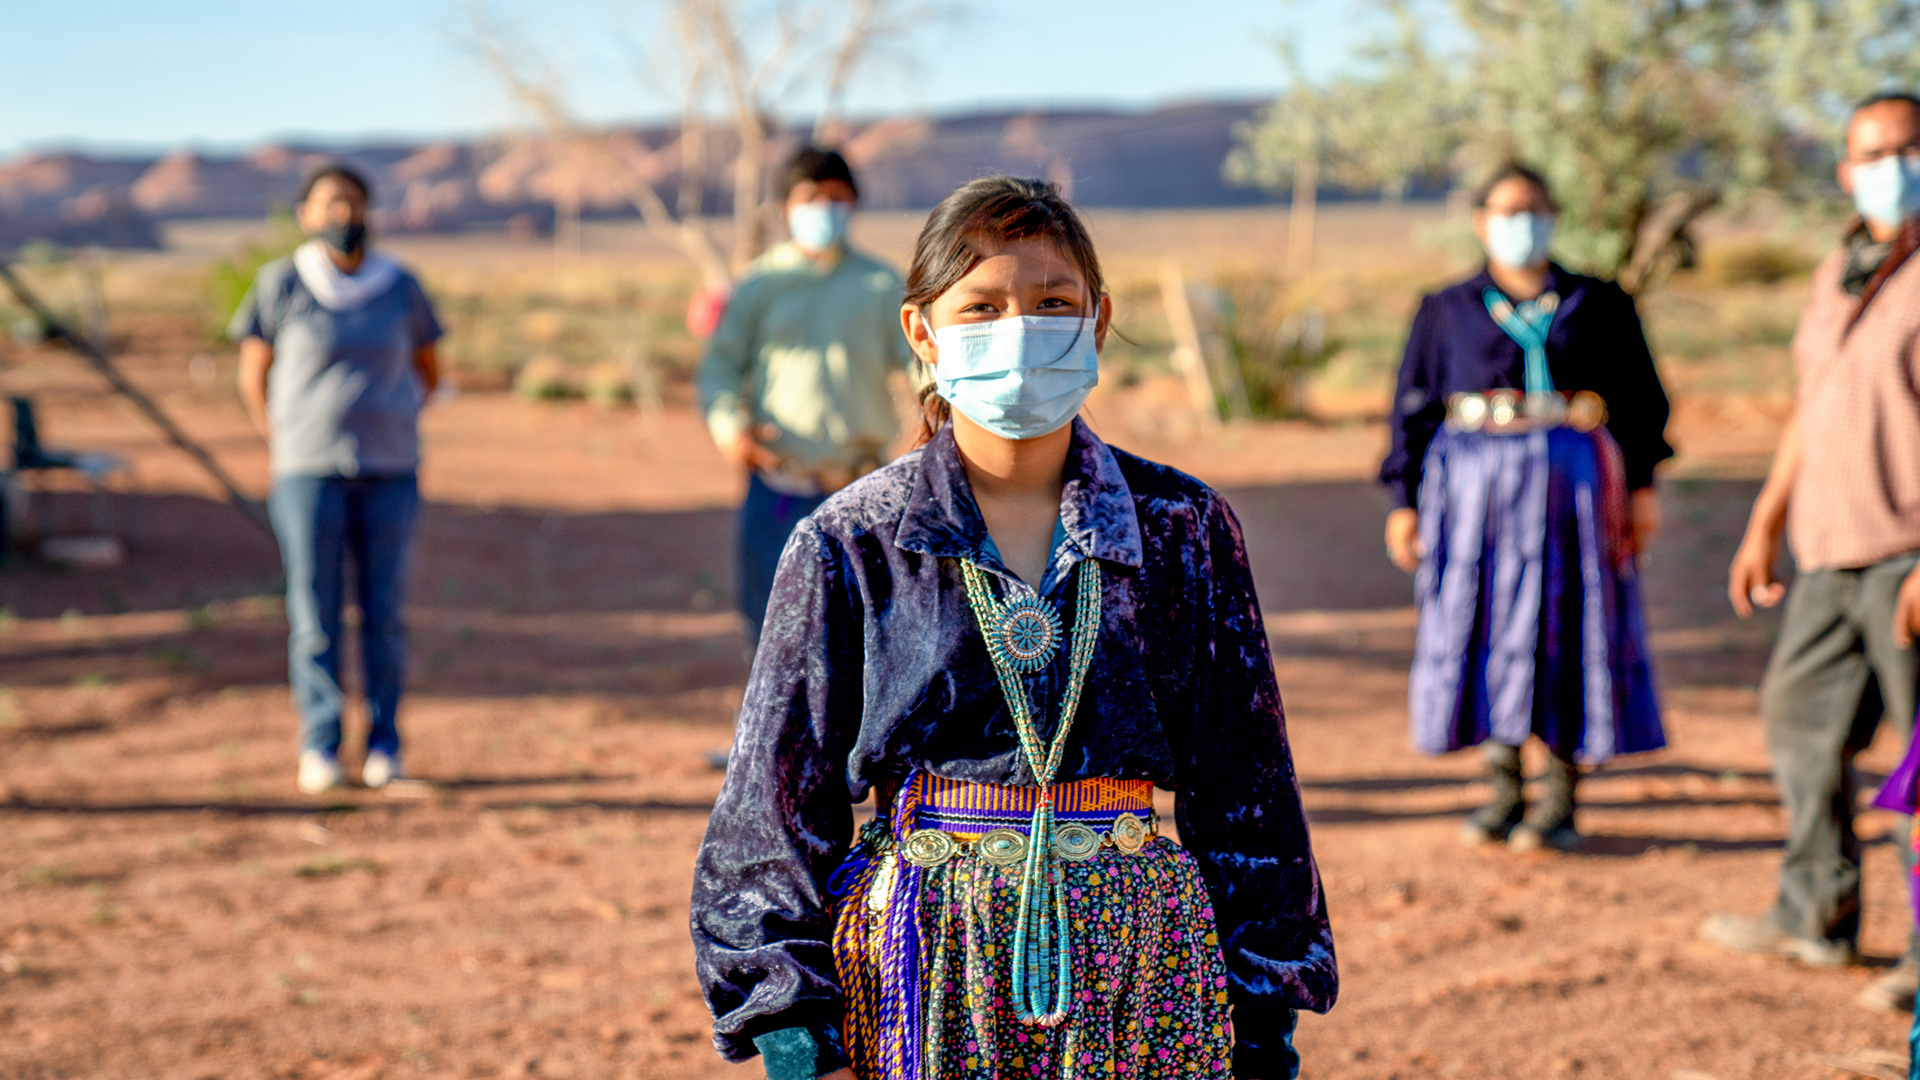 Coronavirus pandemic in Navajo Nation